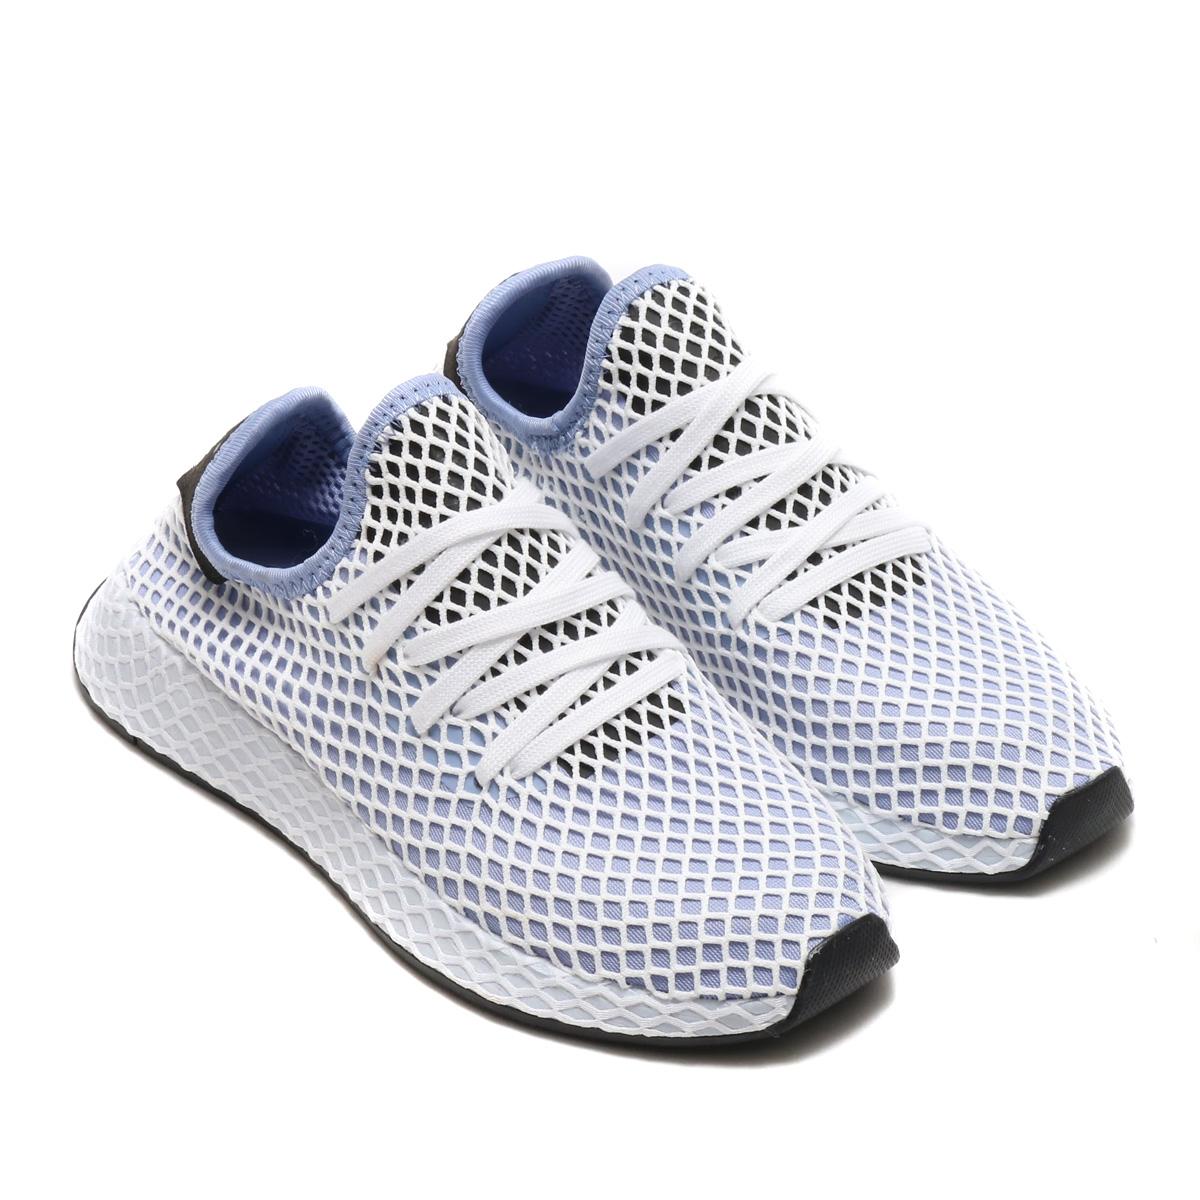 30fb5069856a6 adidas Originals DEERUPT RUNNER W (アディダスオリジナルスディーラプトランナー W) (chalk blue  S18  chalk blue S18  core black) 18SS-I